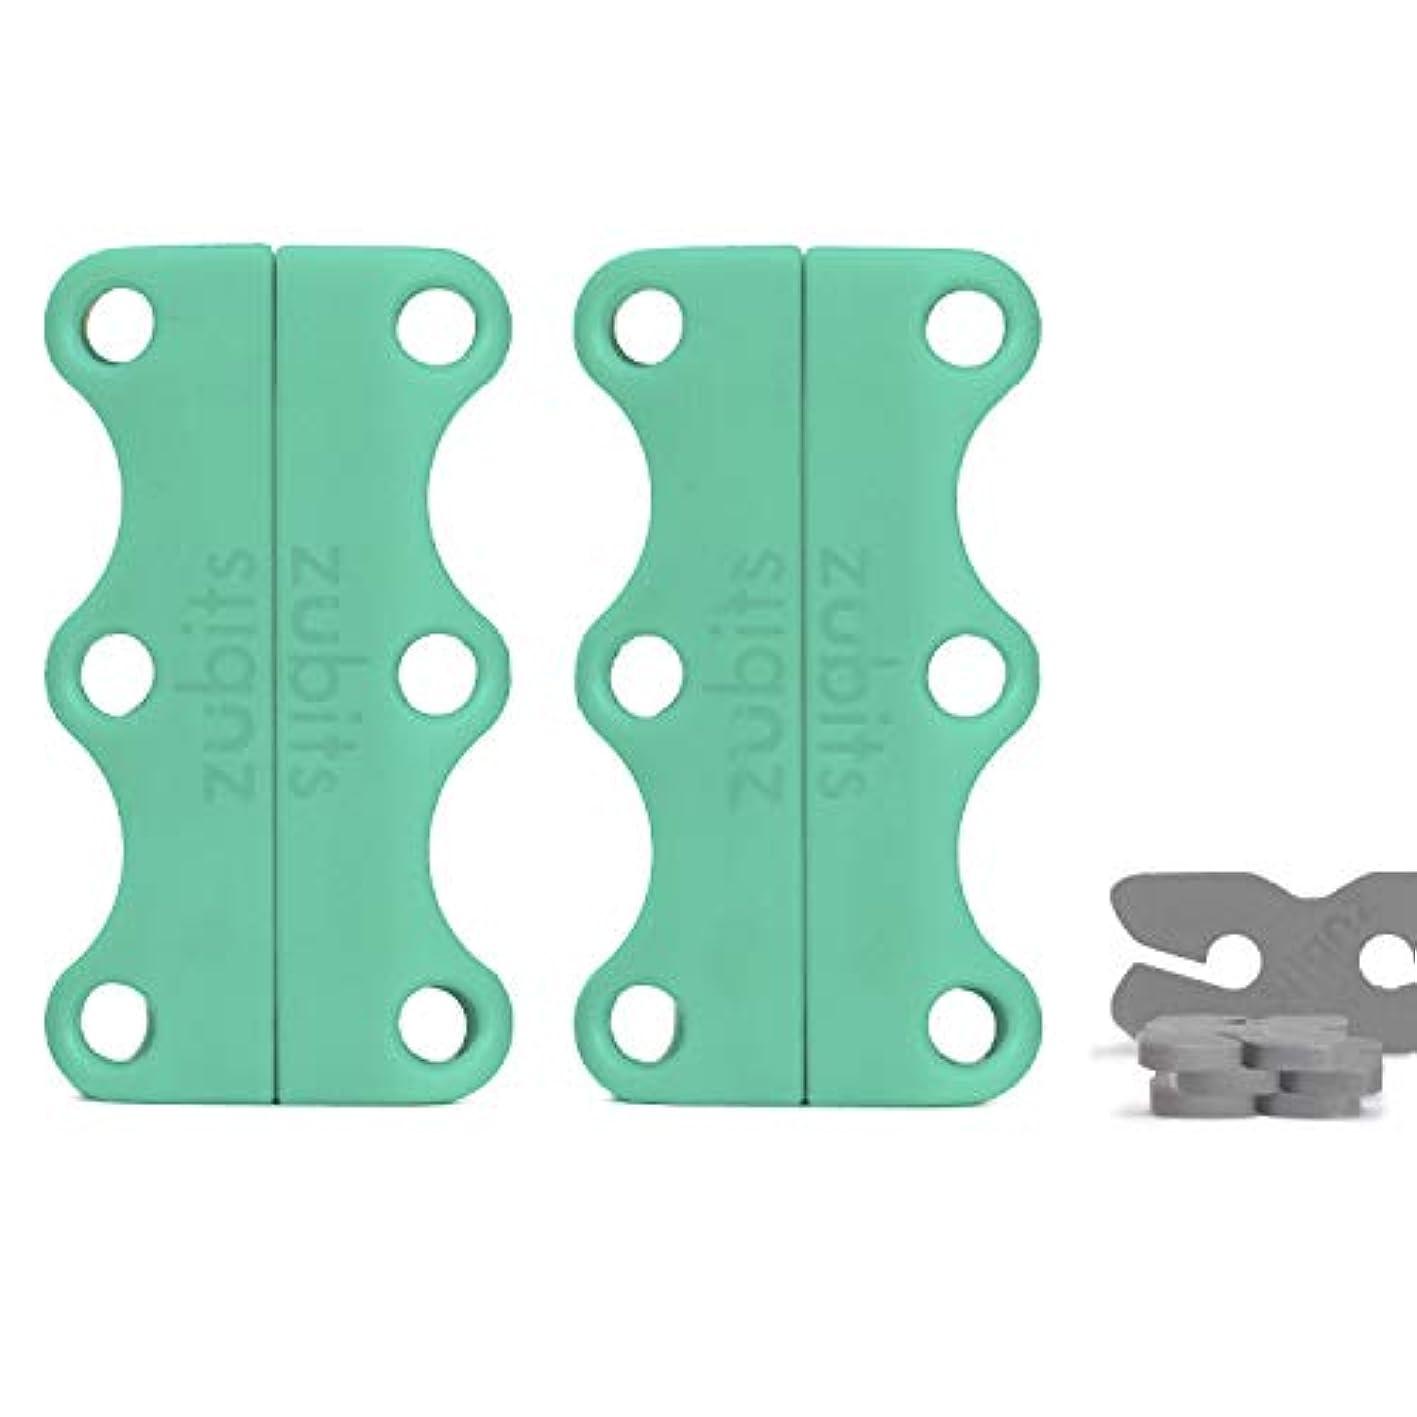 Zubits Magnetic Lacing Solution yupboabmjek552